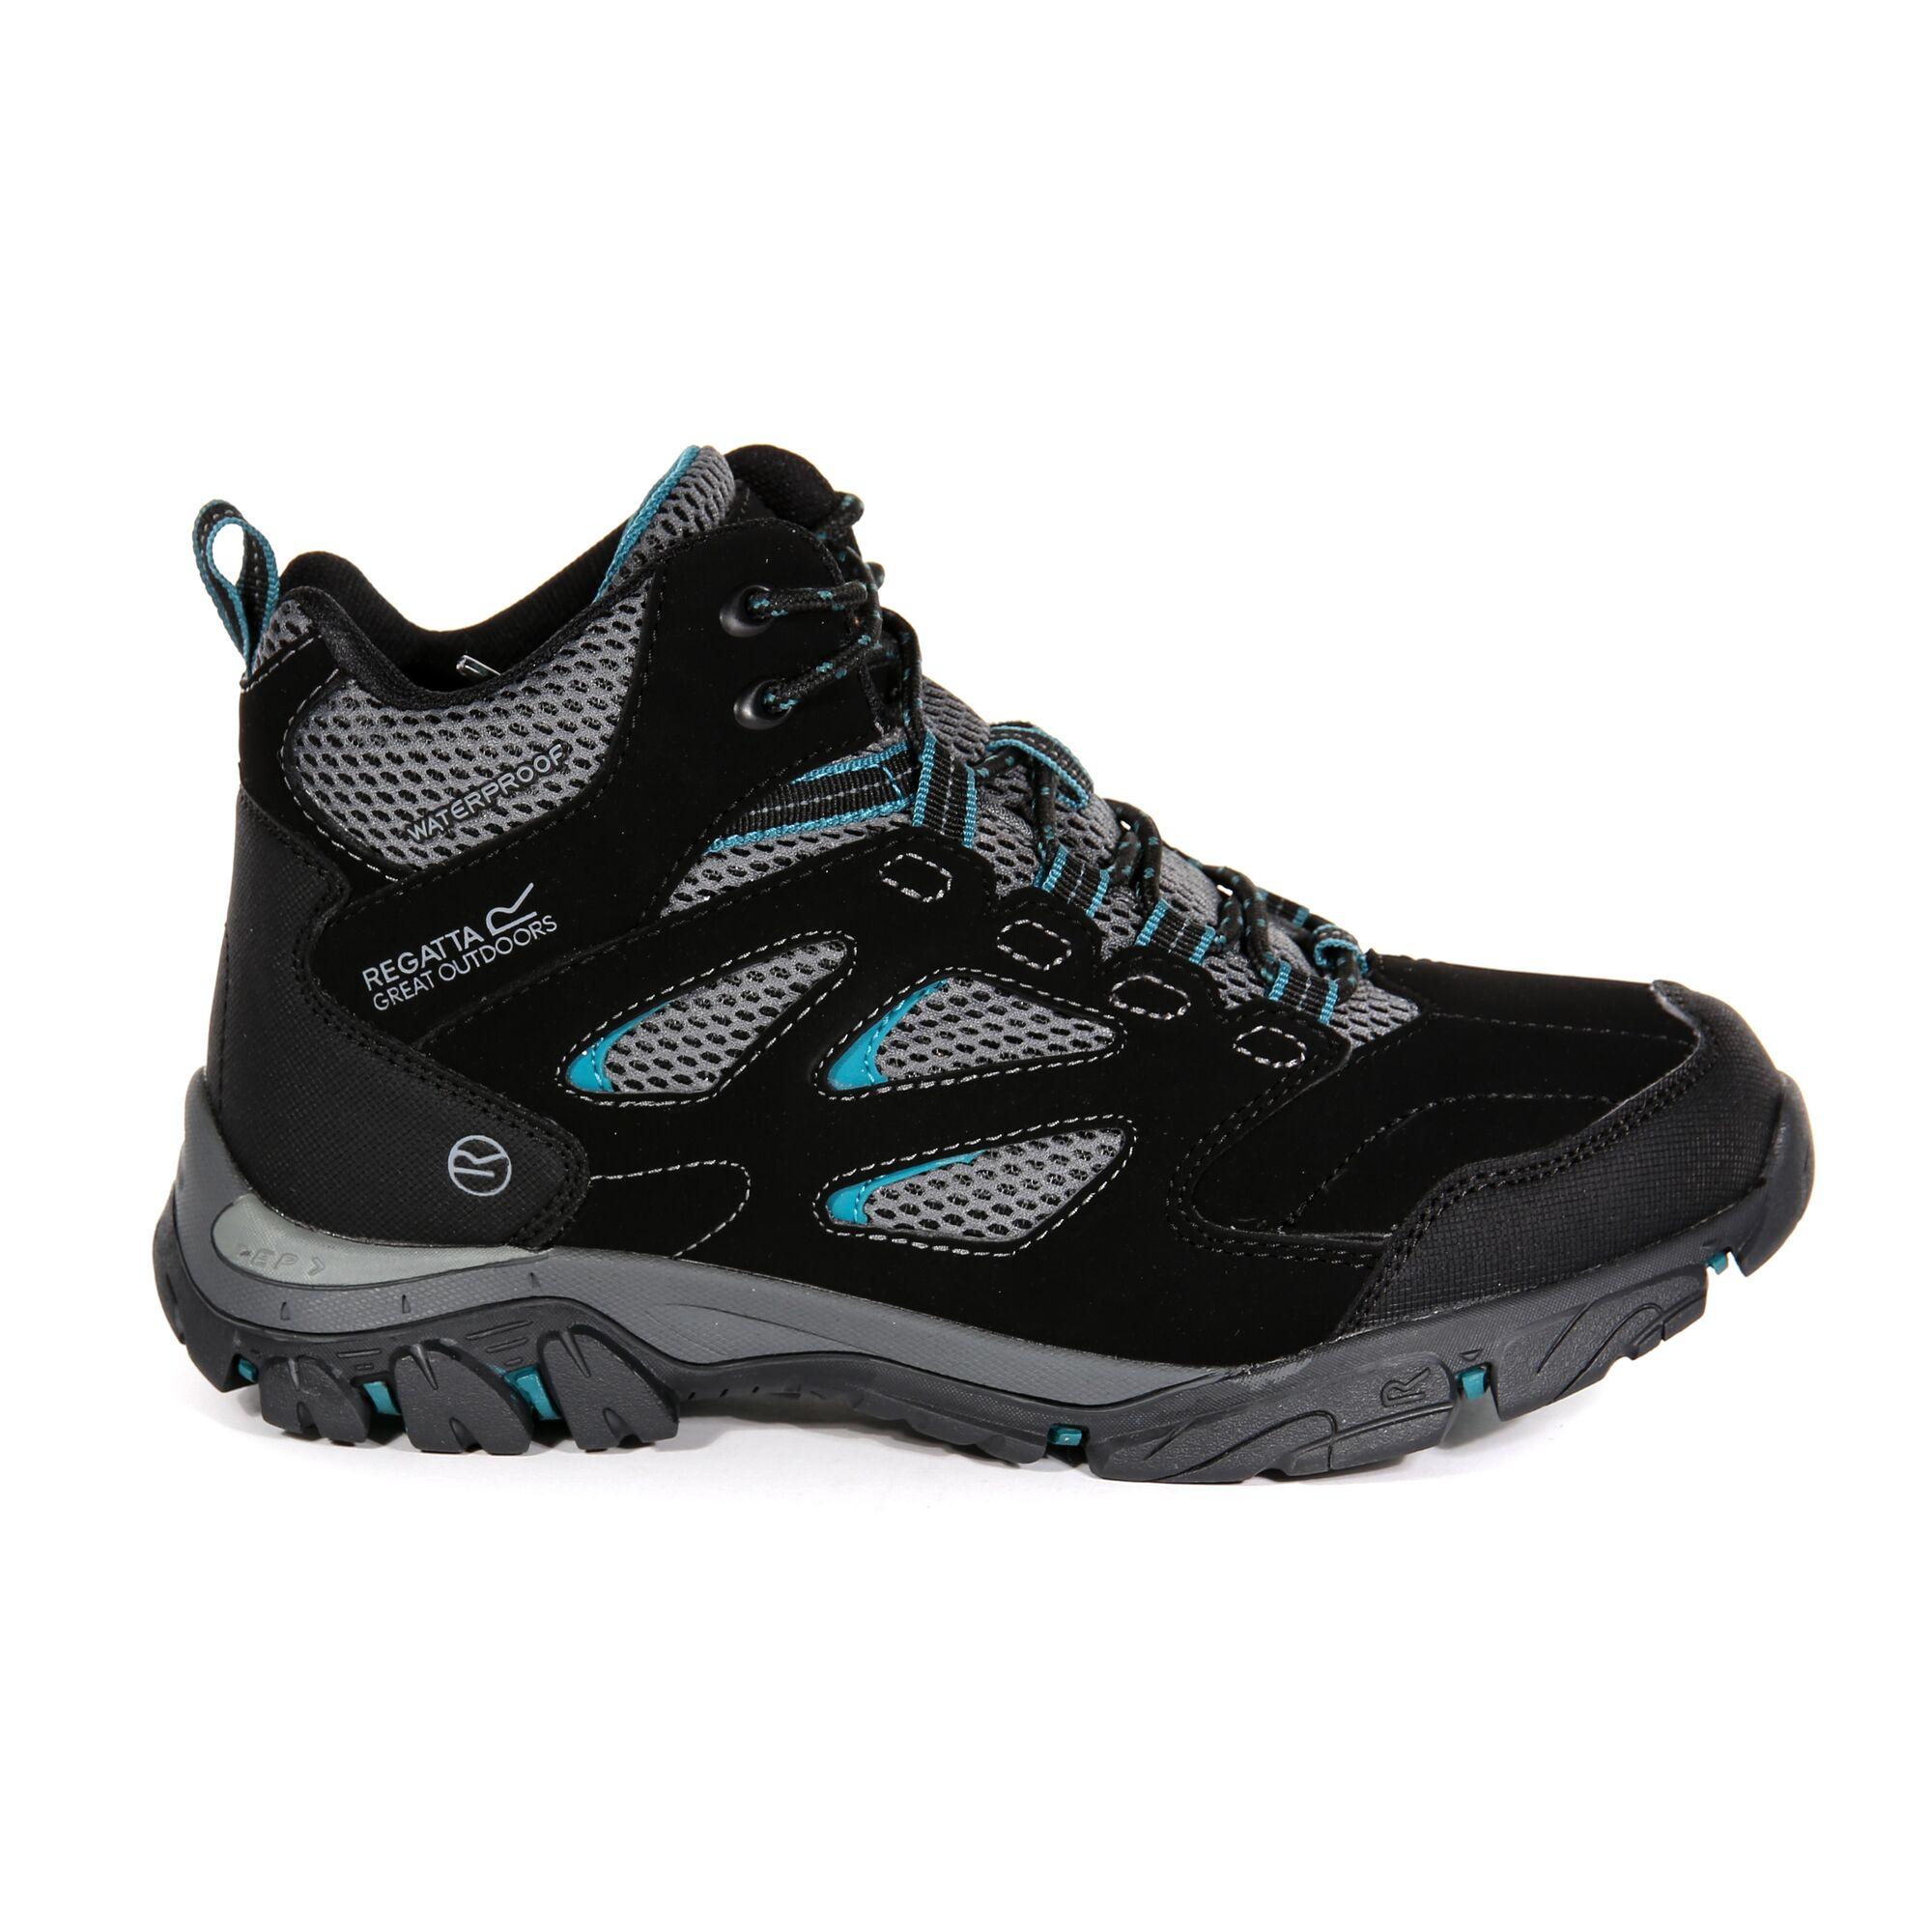 Regatta Women/'s Holcombe IEP Mid Walking Boots Black